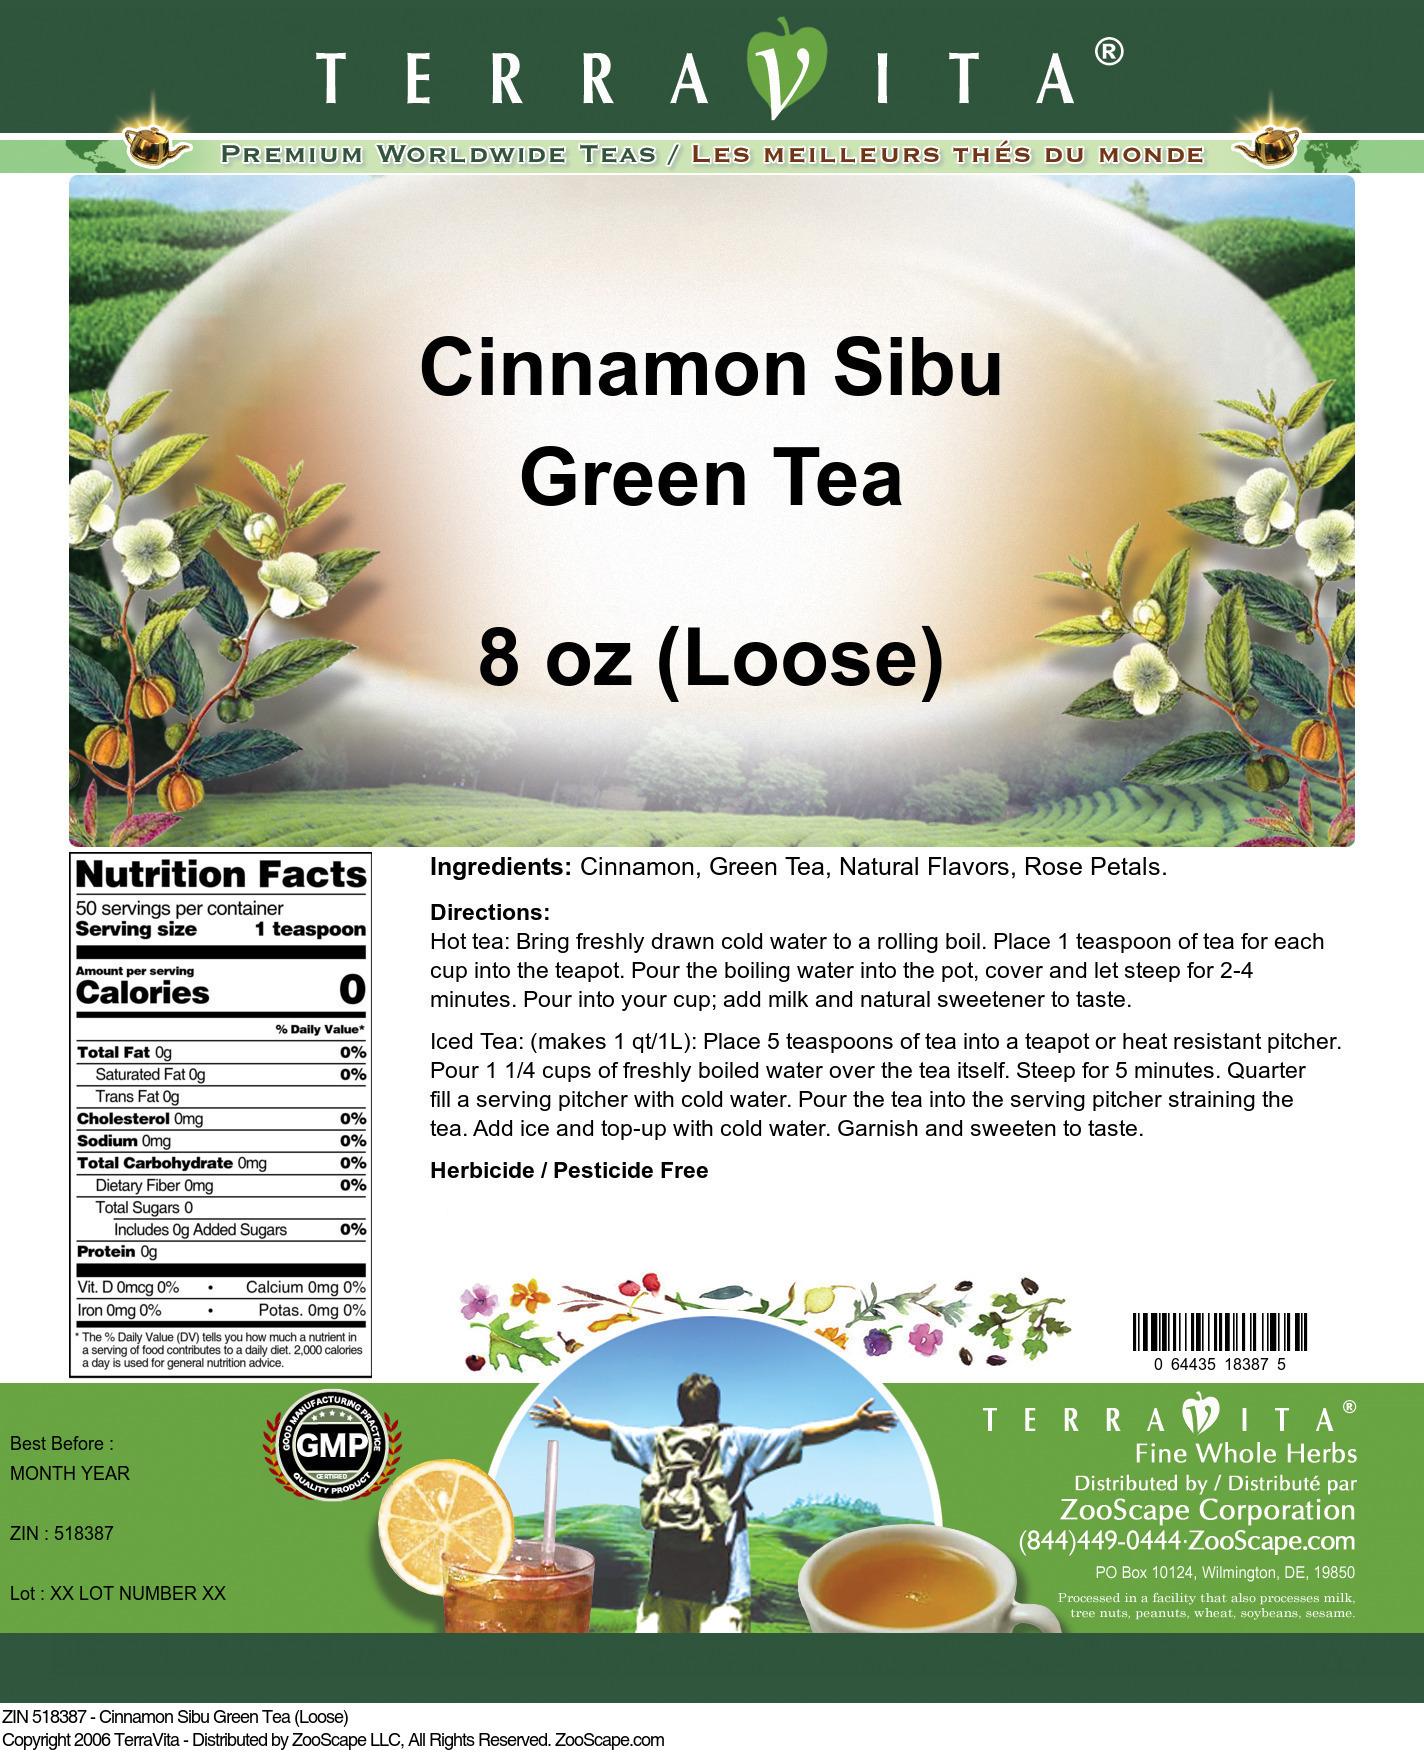 Cinnamon Sibu Green Tea (Loose)